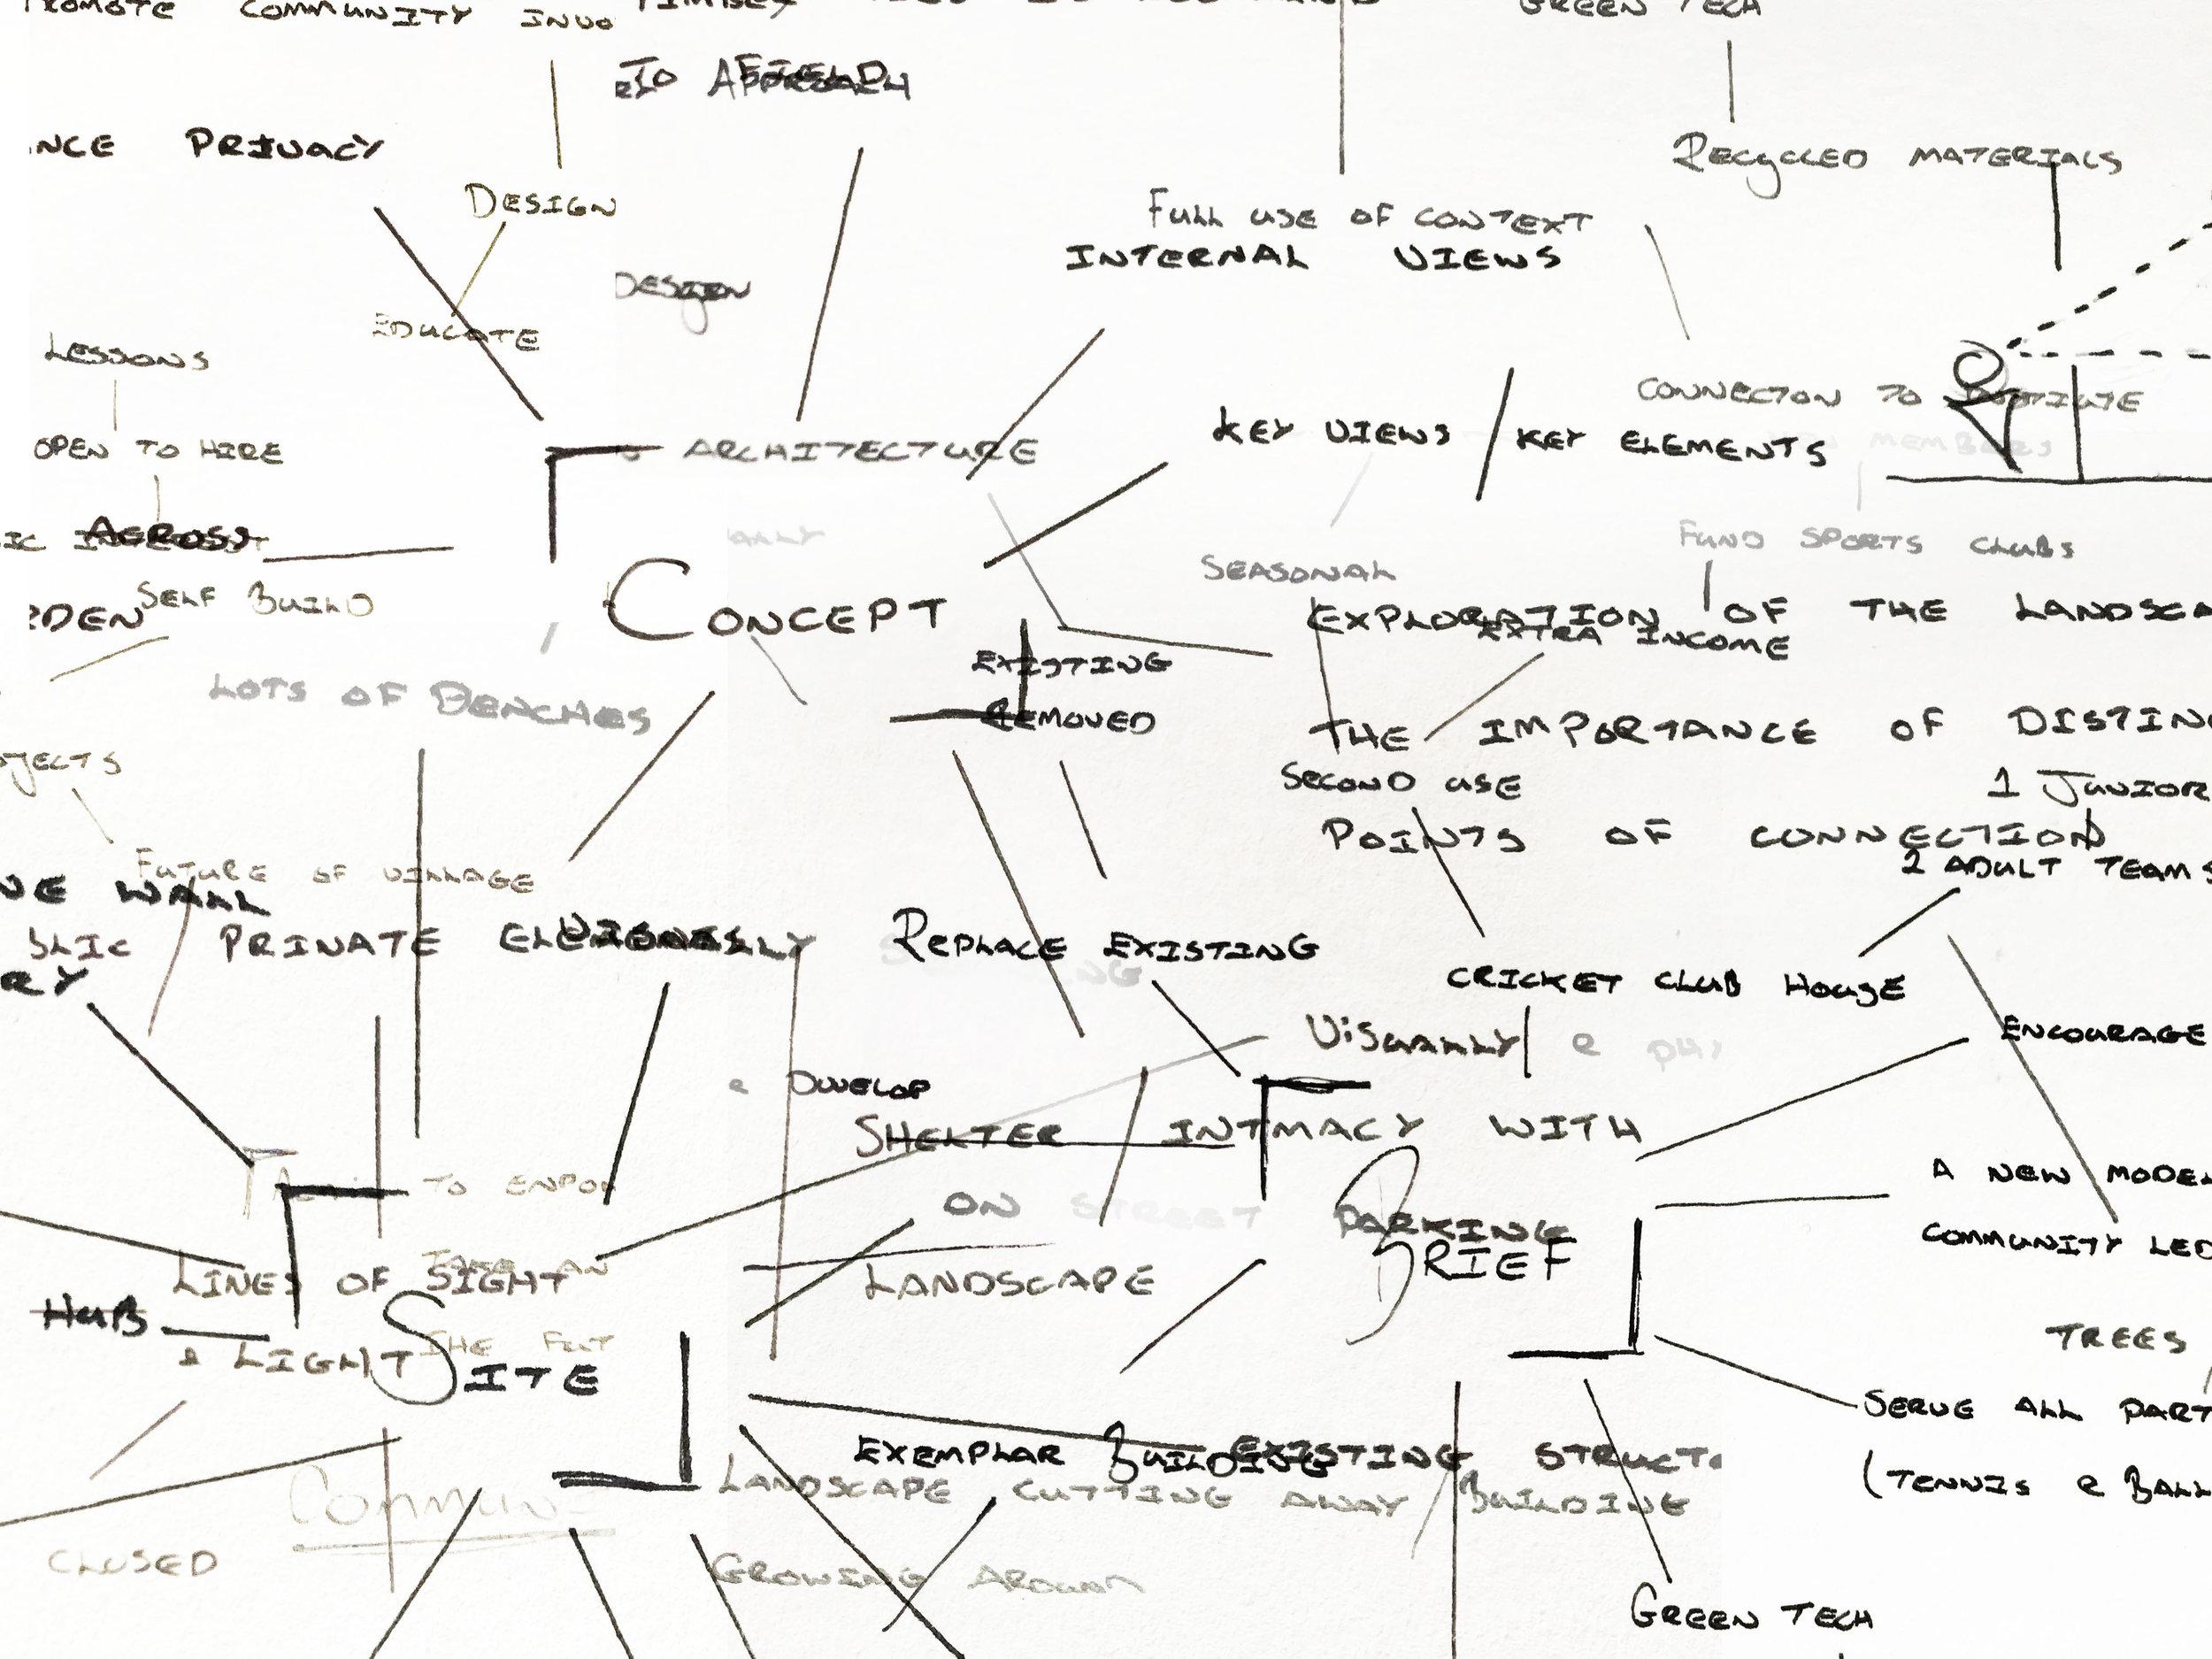 Archisoup-architecture-site-analysis-presentation-diagrams-symbols.jpg